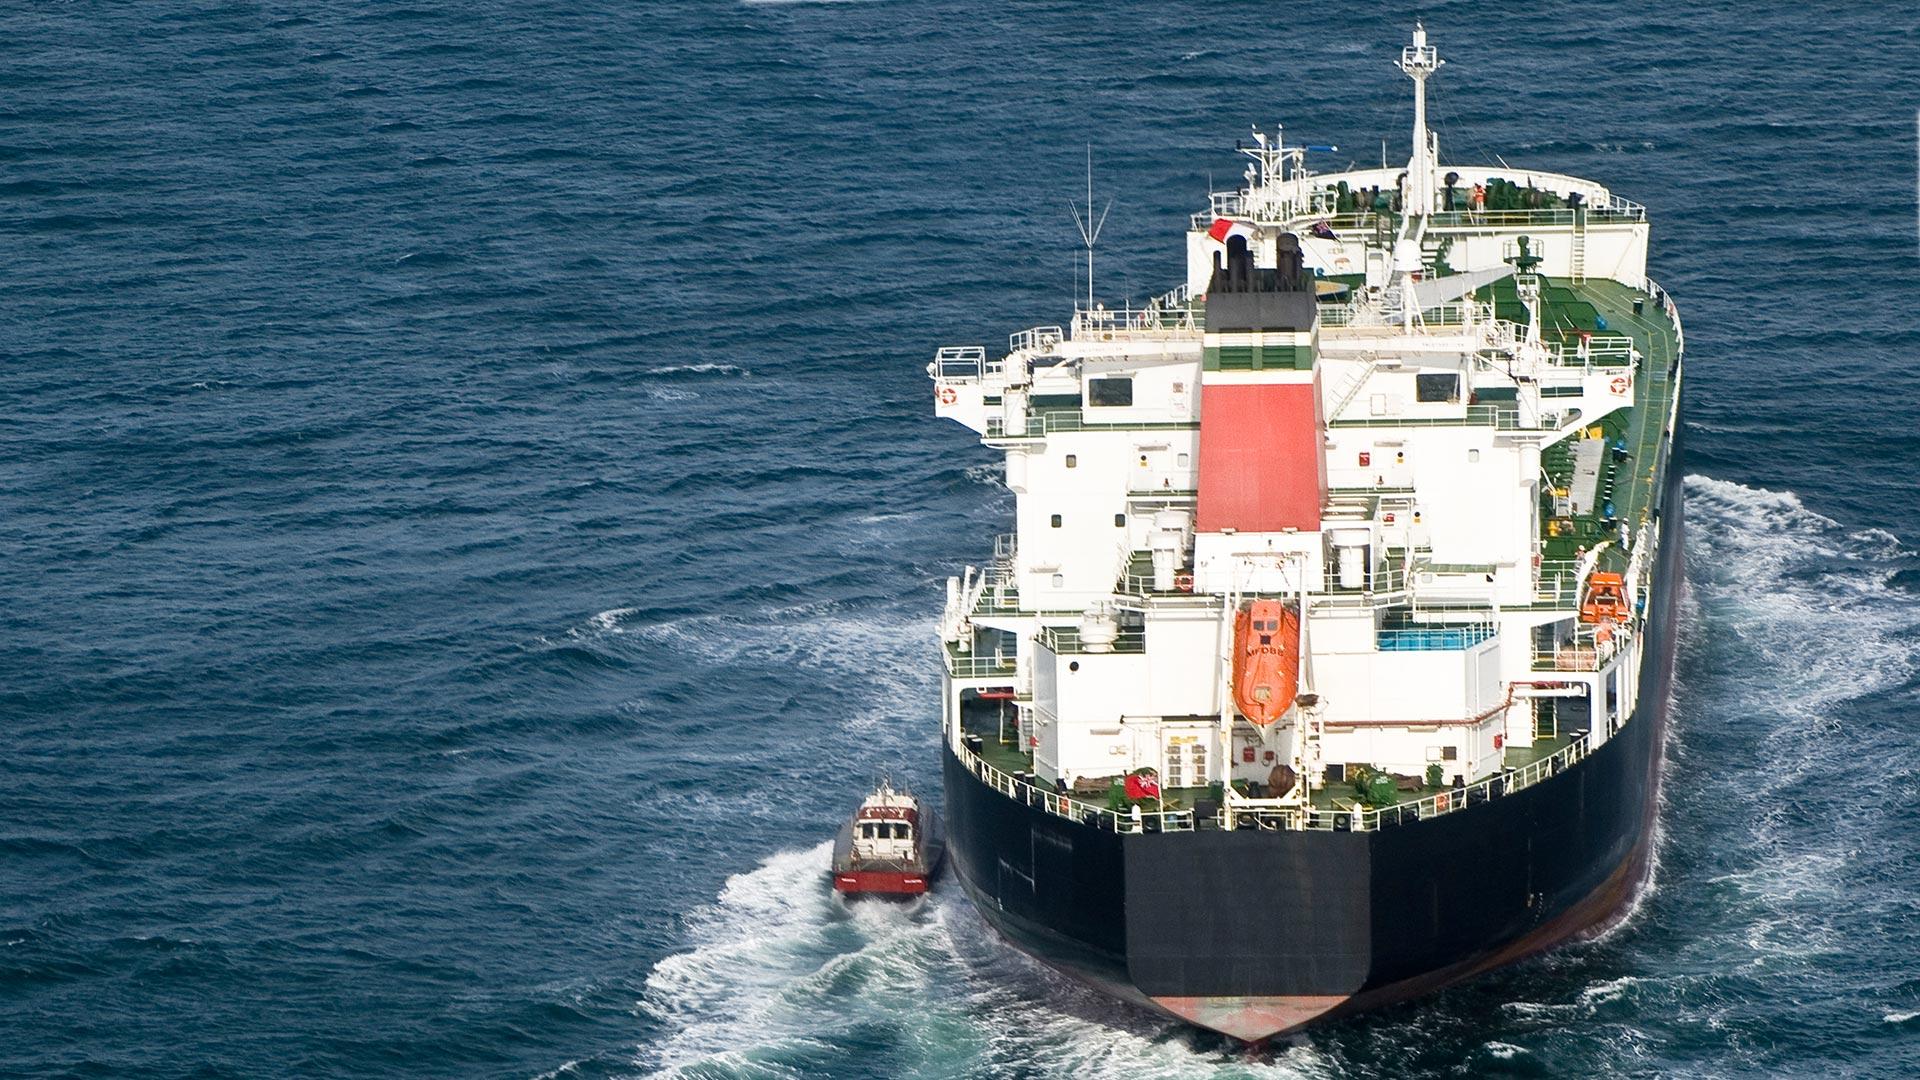 Tanker and tugboat